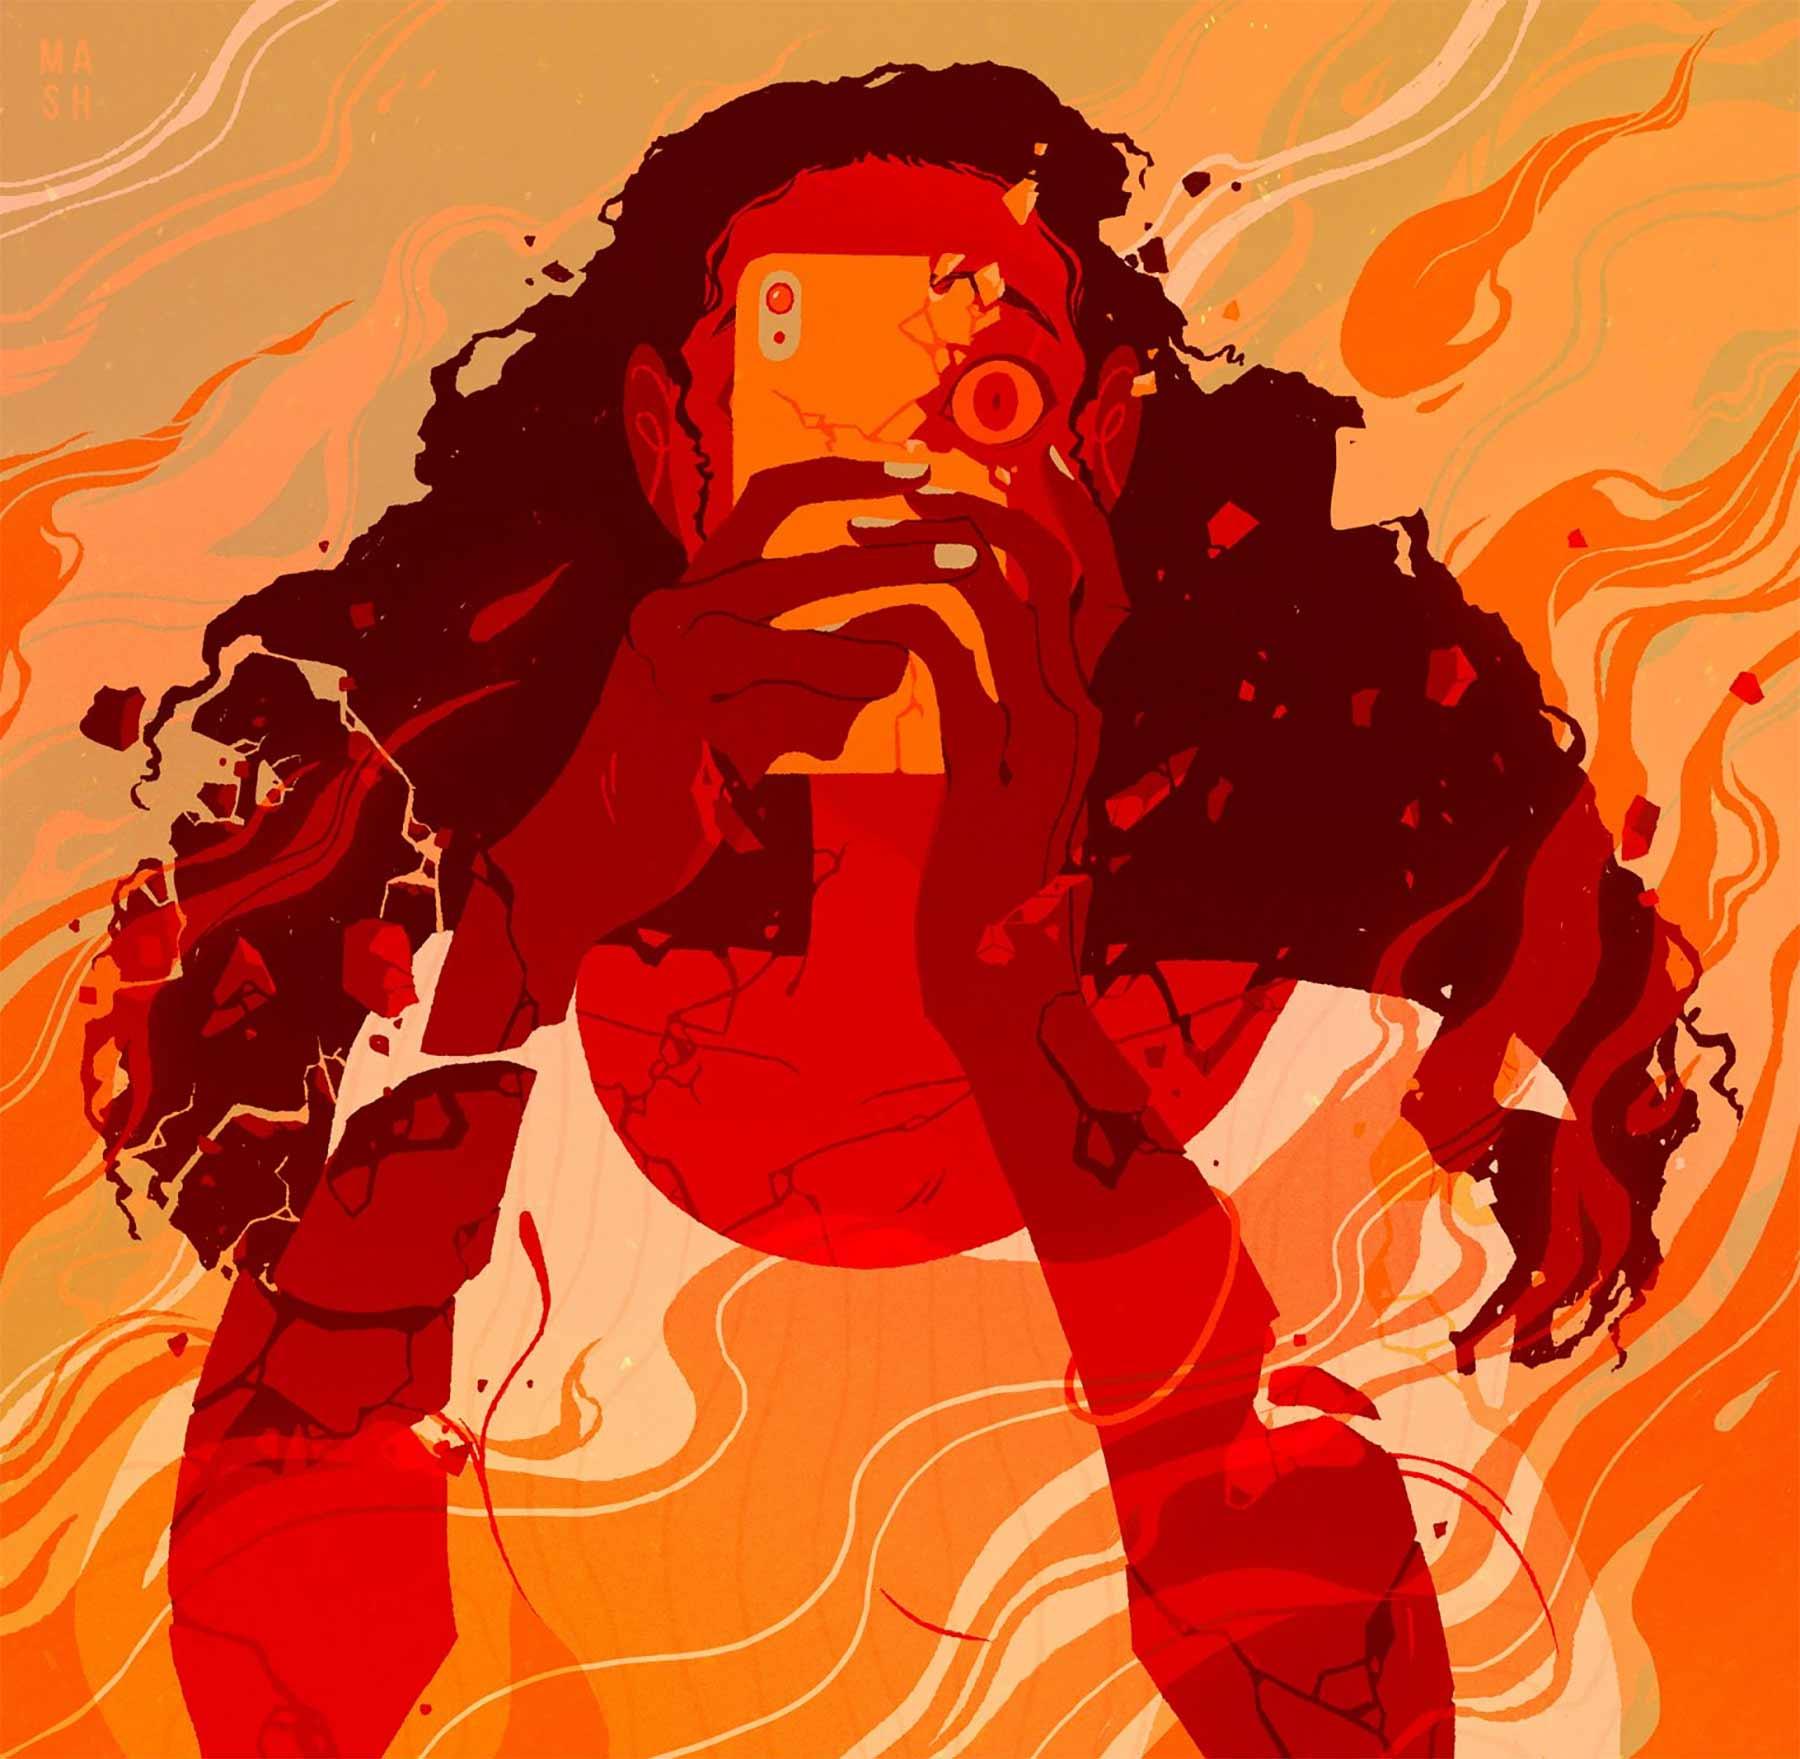 Illustrationen von Samantha Mash samantha-mash-illustrationen_02